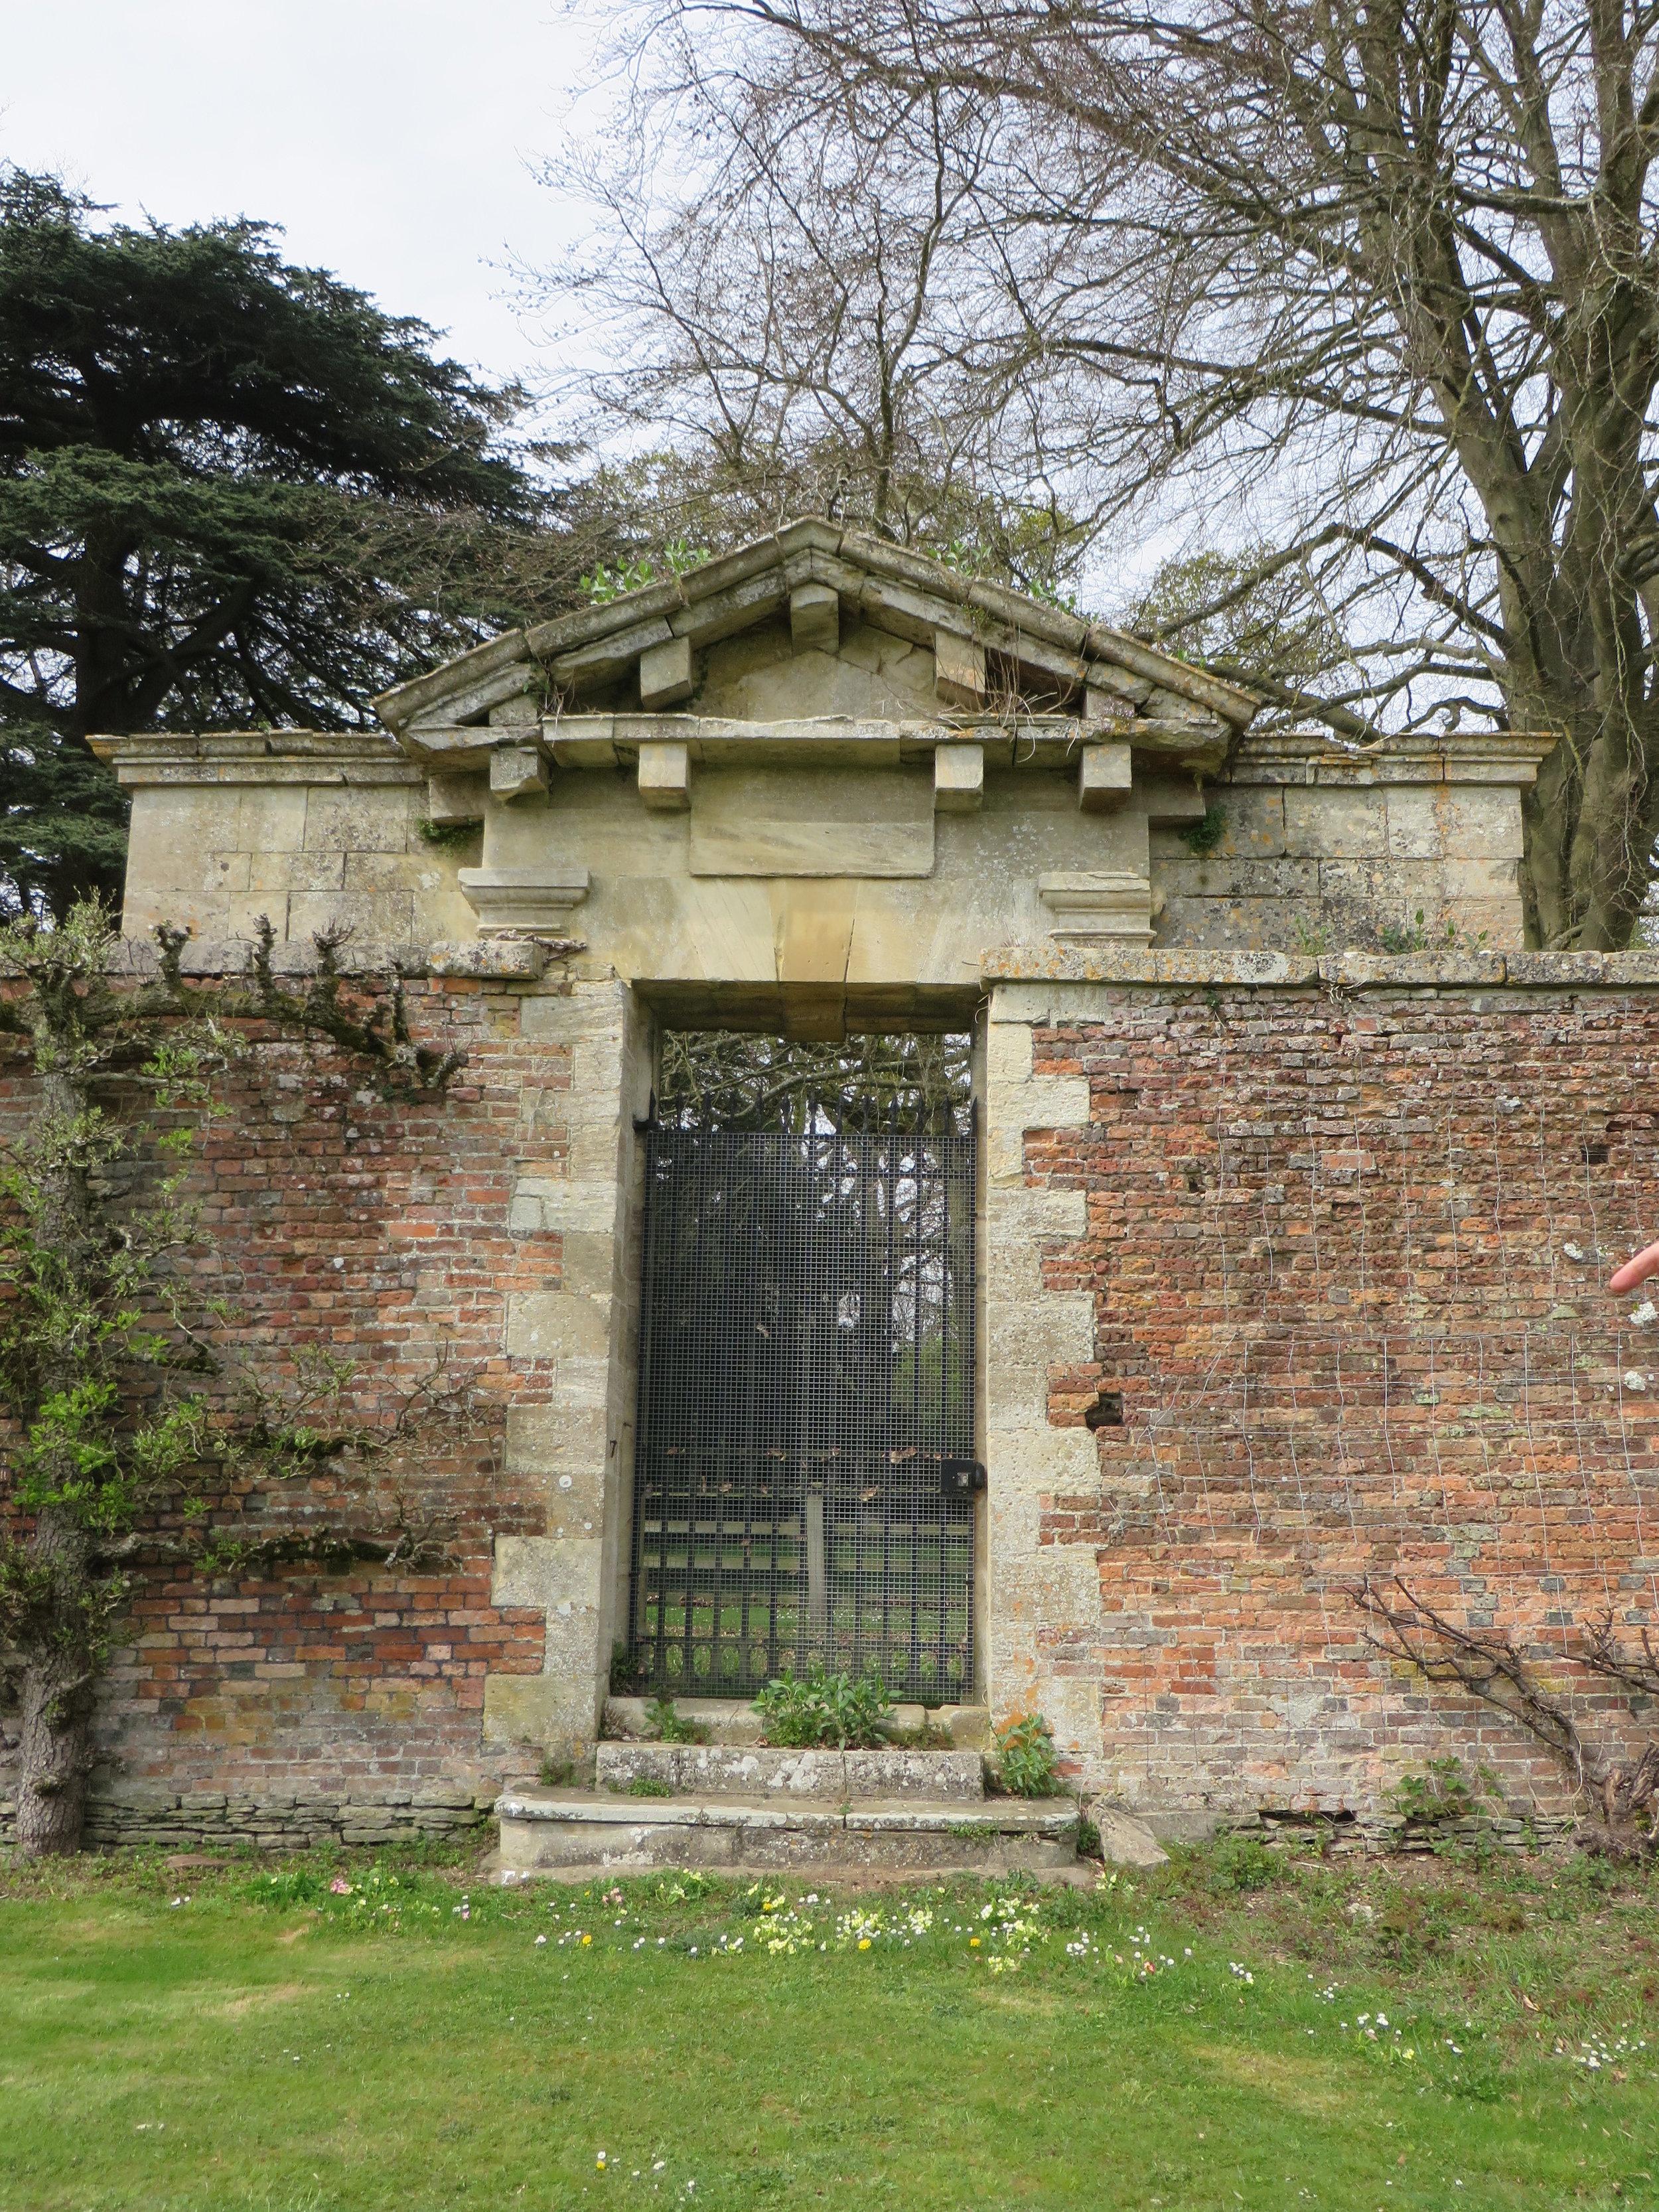 Chamber's Gate, Blenheim Palace